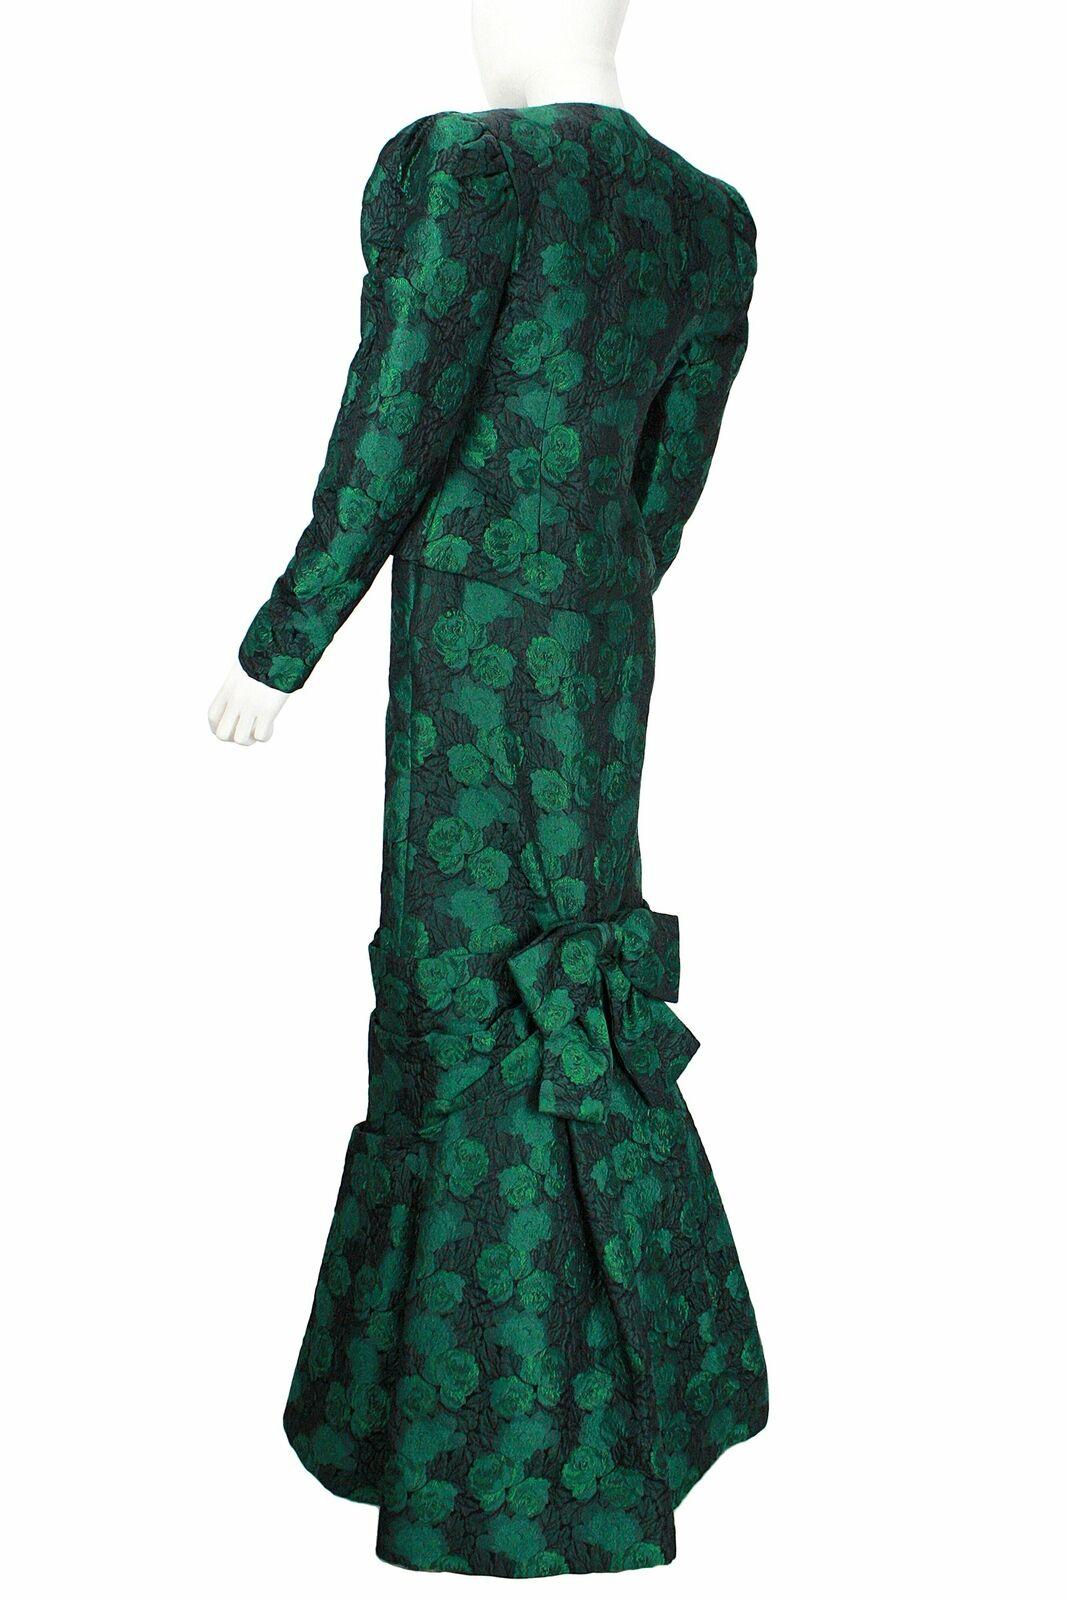 ARNOLD SCAASI 1980s Dark Green Floral Brocade Gow… - image 5